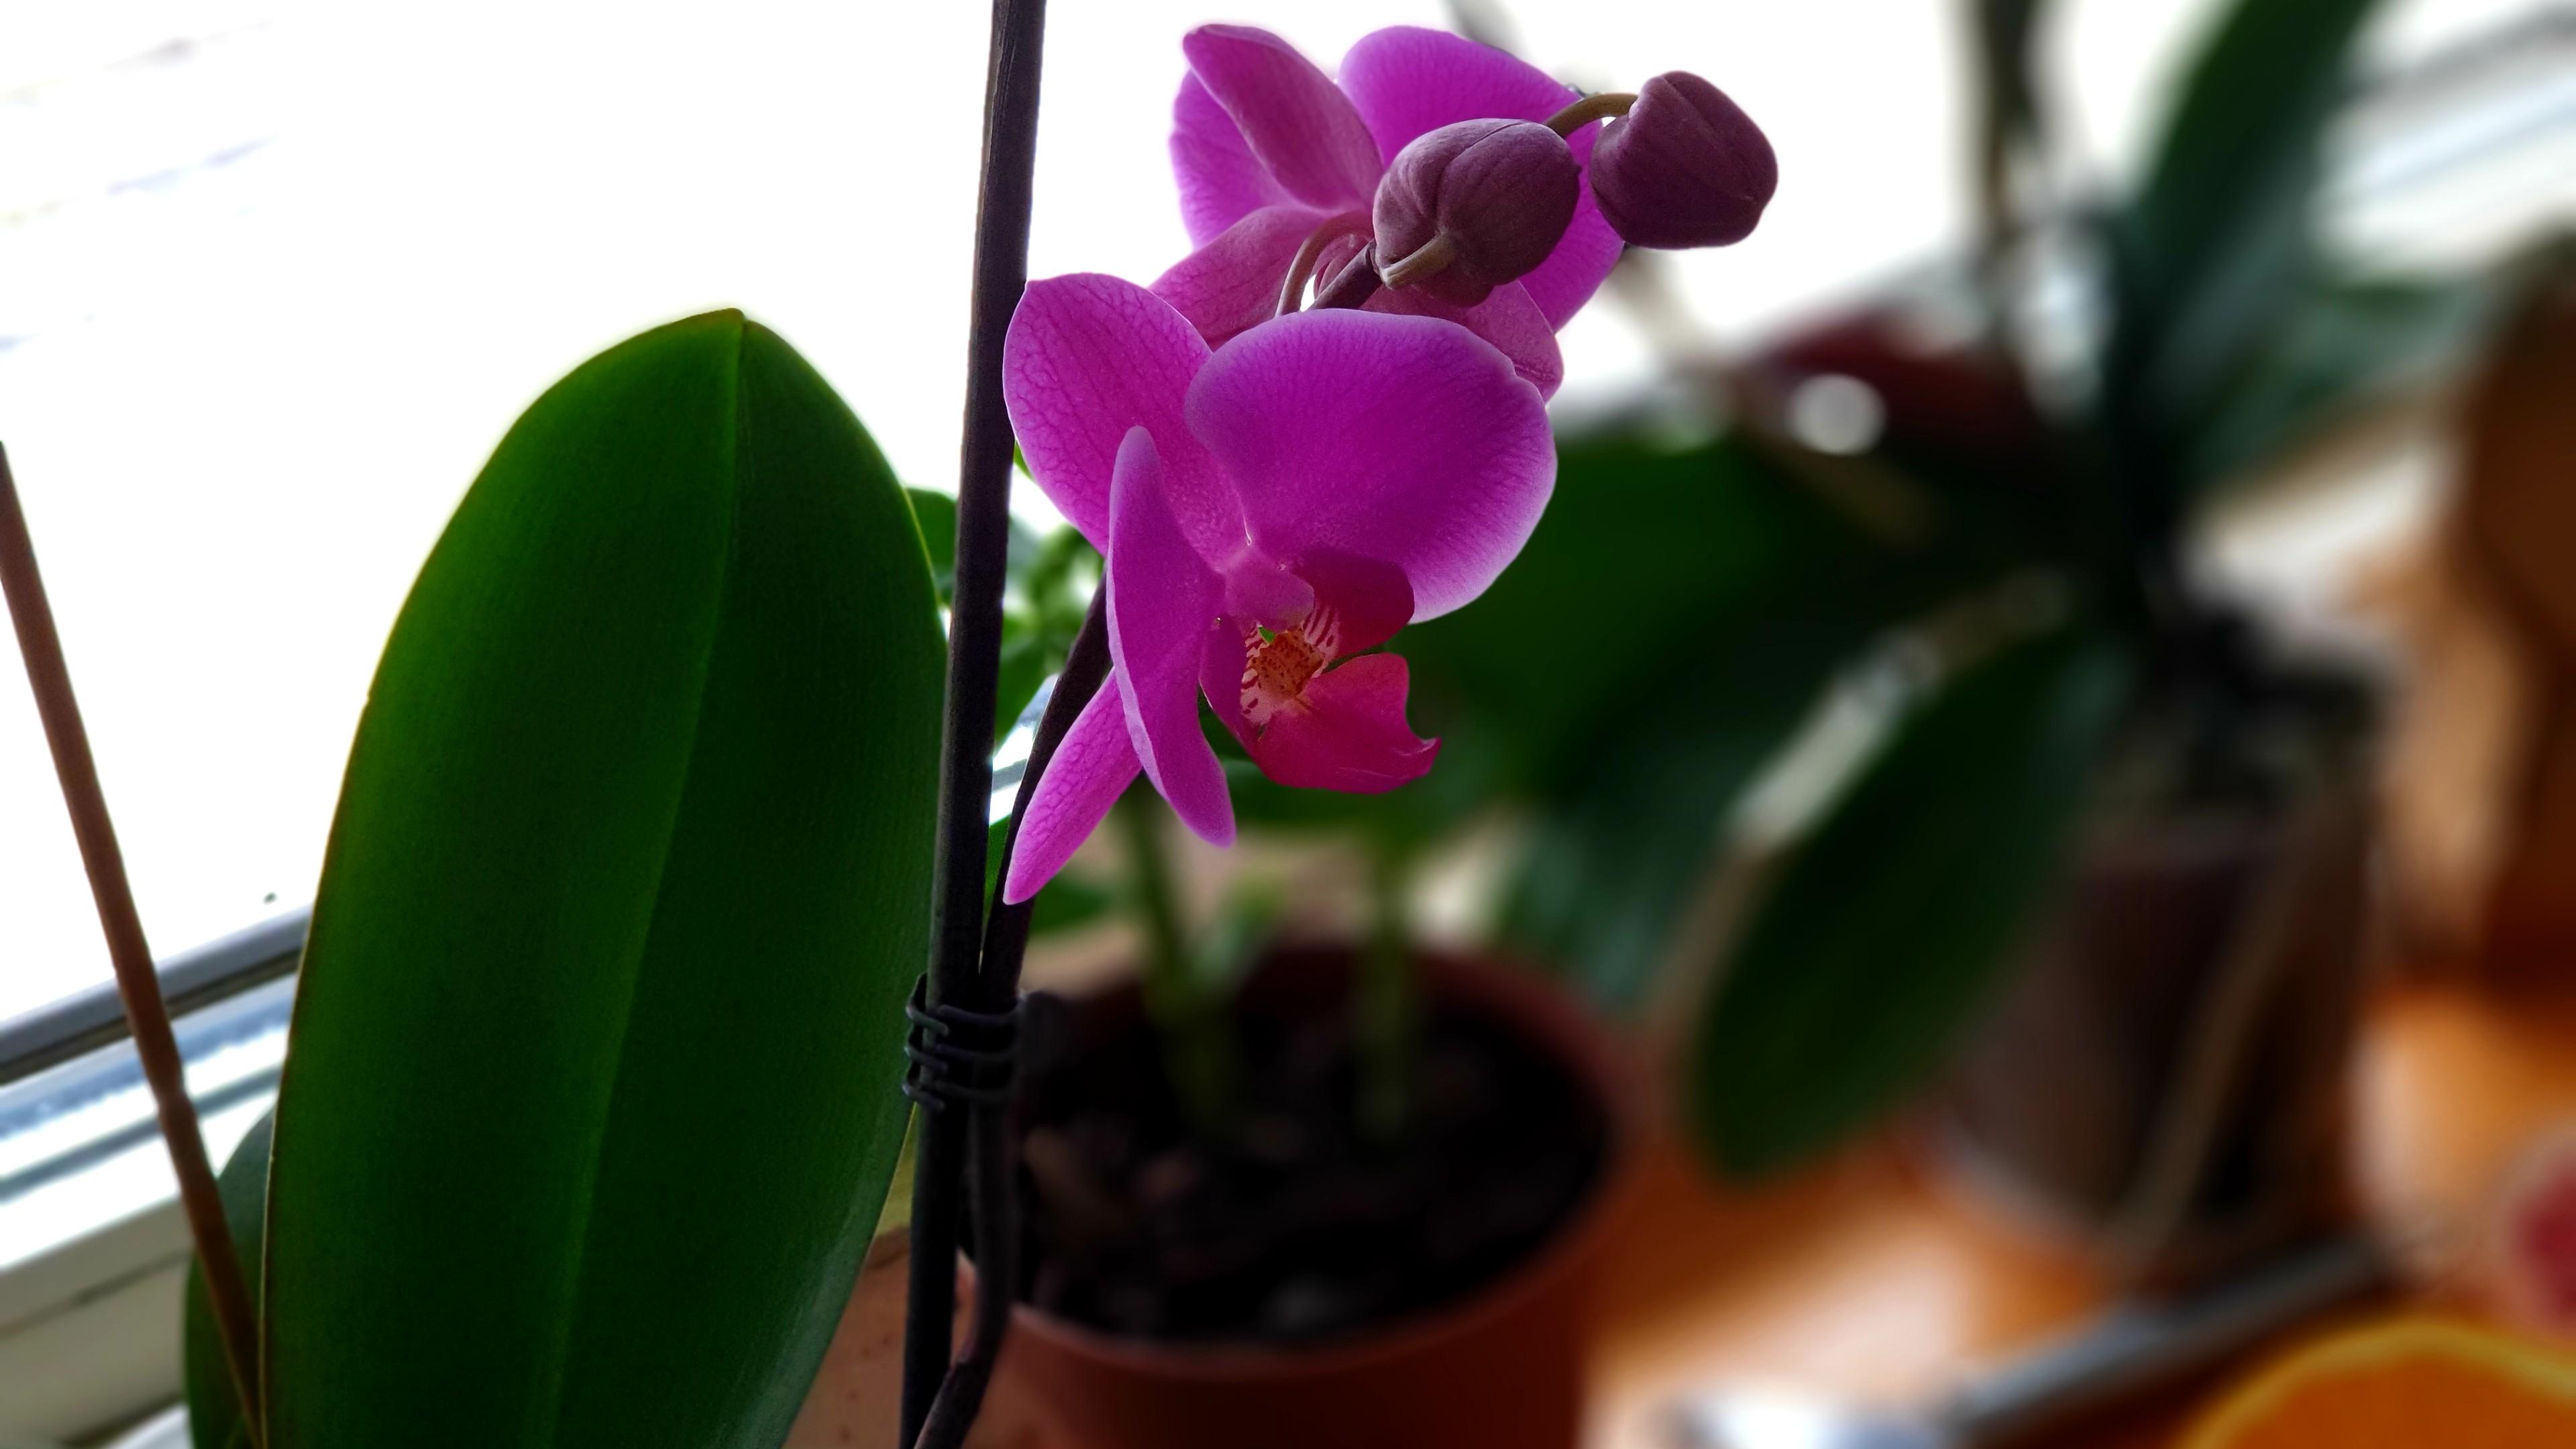 Orchid wallpaper